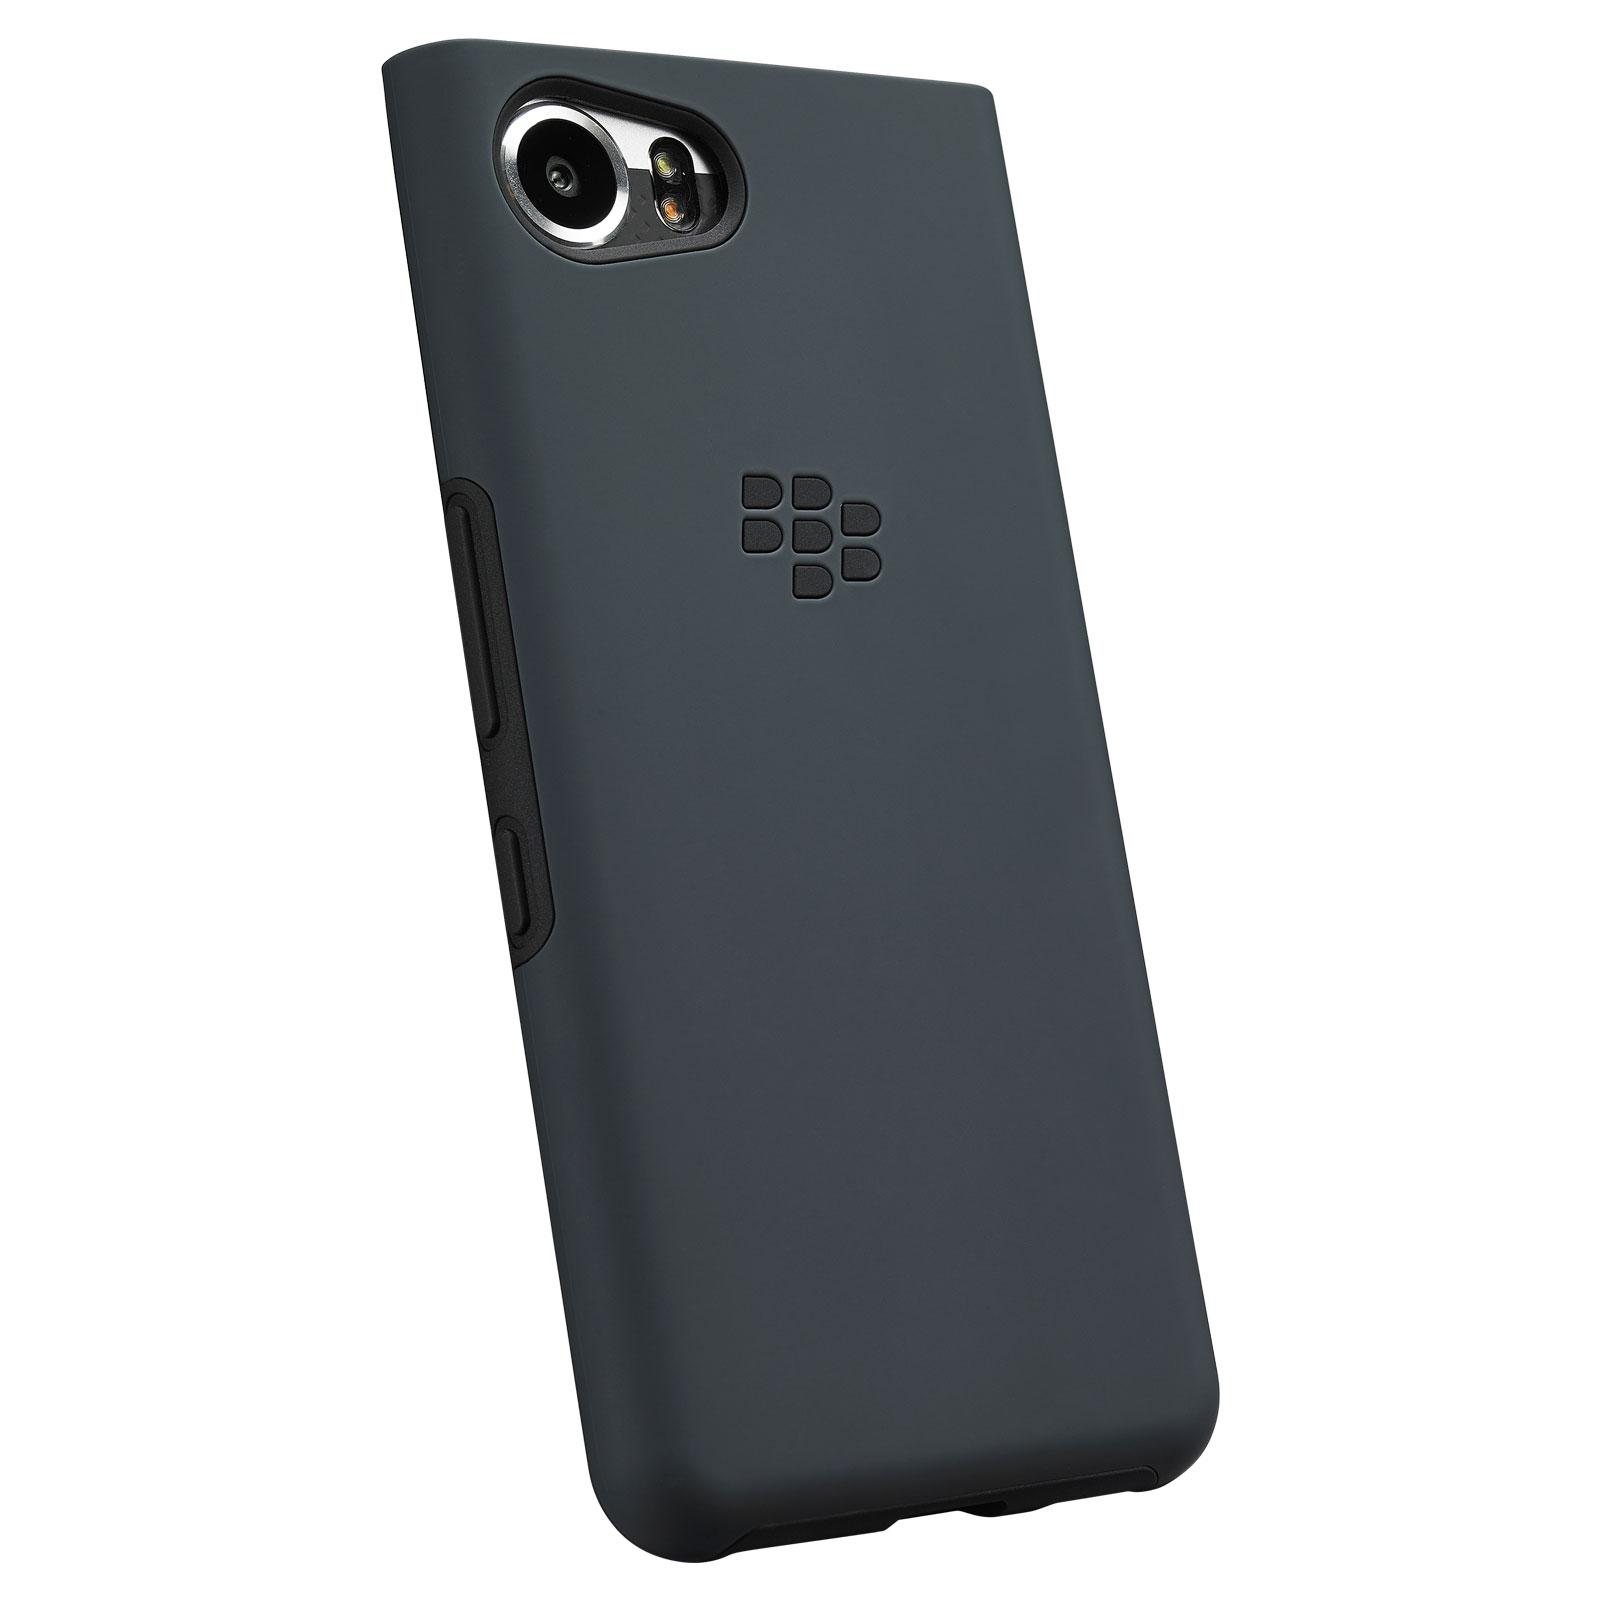 blackberry dual layer shell bleu noir keyone etui t l phone blackberry sur. Black Bedroom Furniture Sets. Home Design Ideas